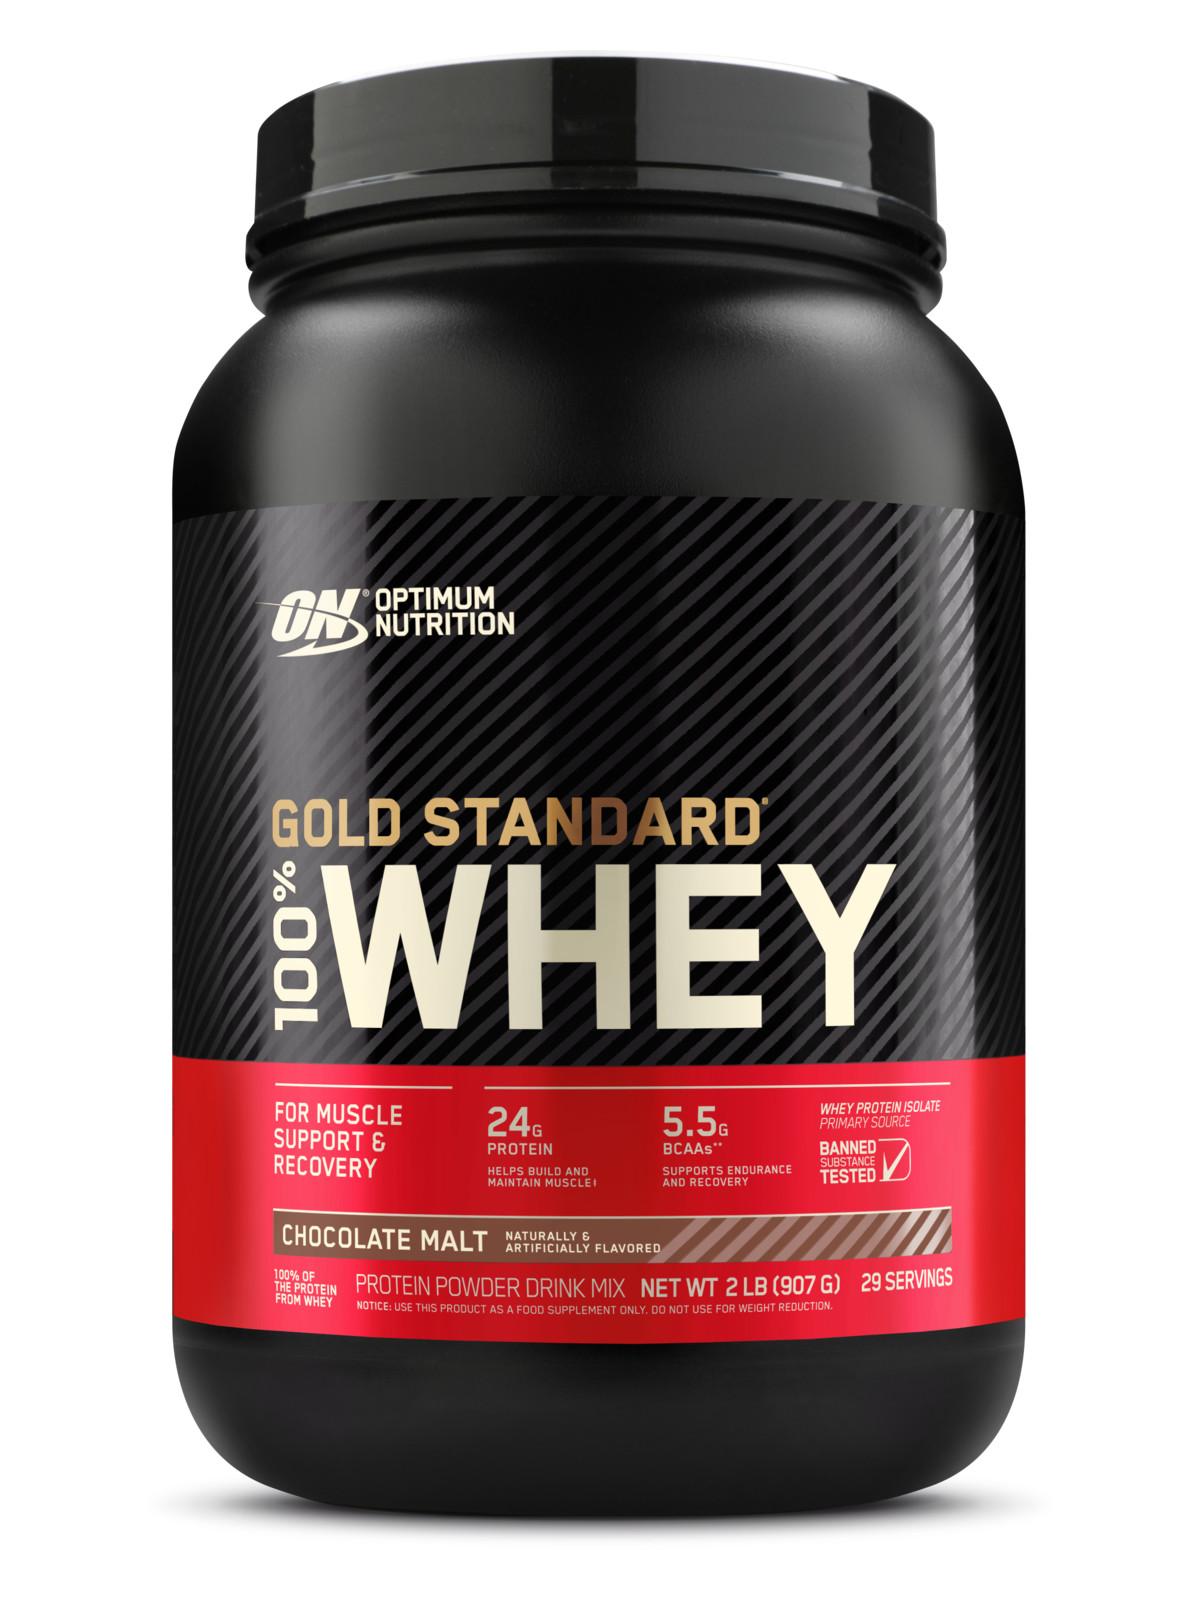 Протеин gold standard whey: схема приема, дозировка, состав, назначение, показания, противопоказания и эффект - tony.ru